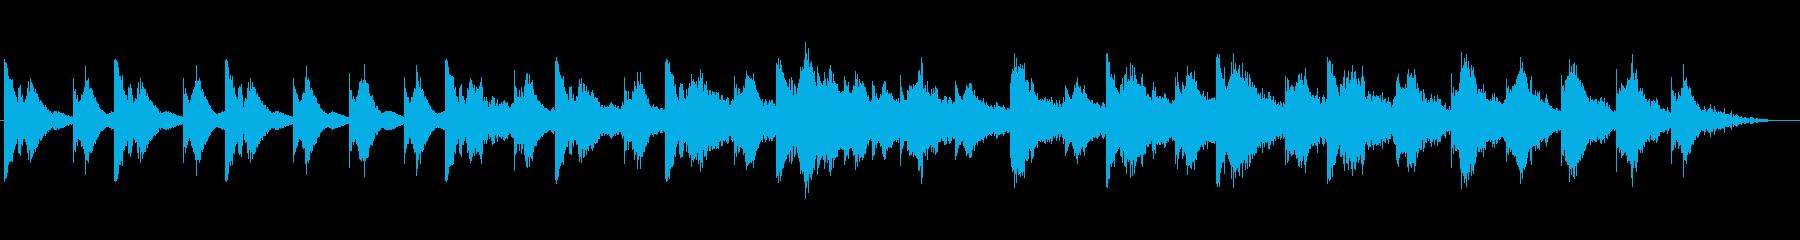 KANTアンビエント1疑惑と不条理不気味の再生済みの波形